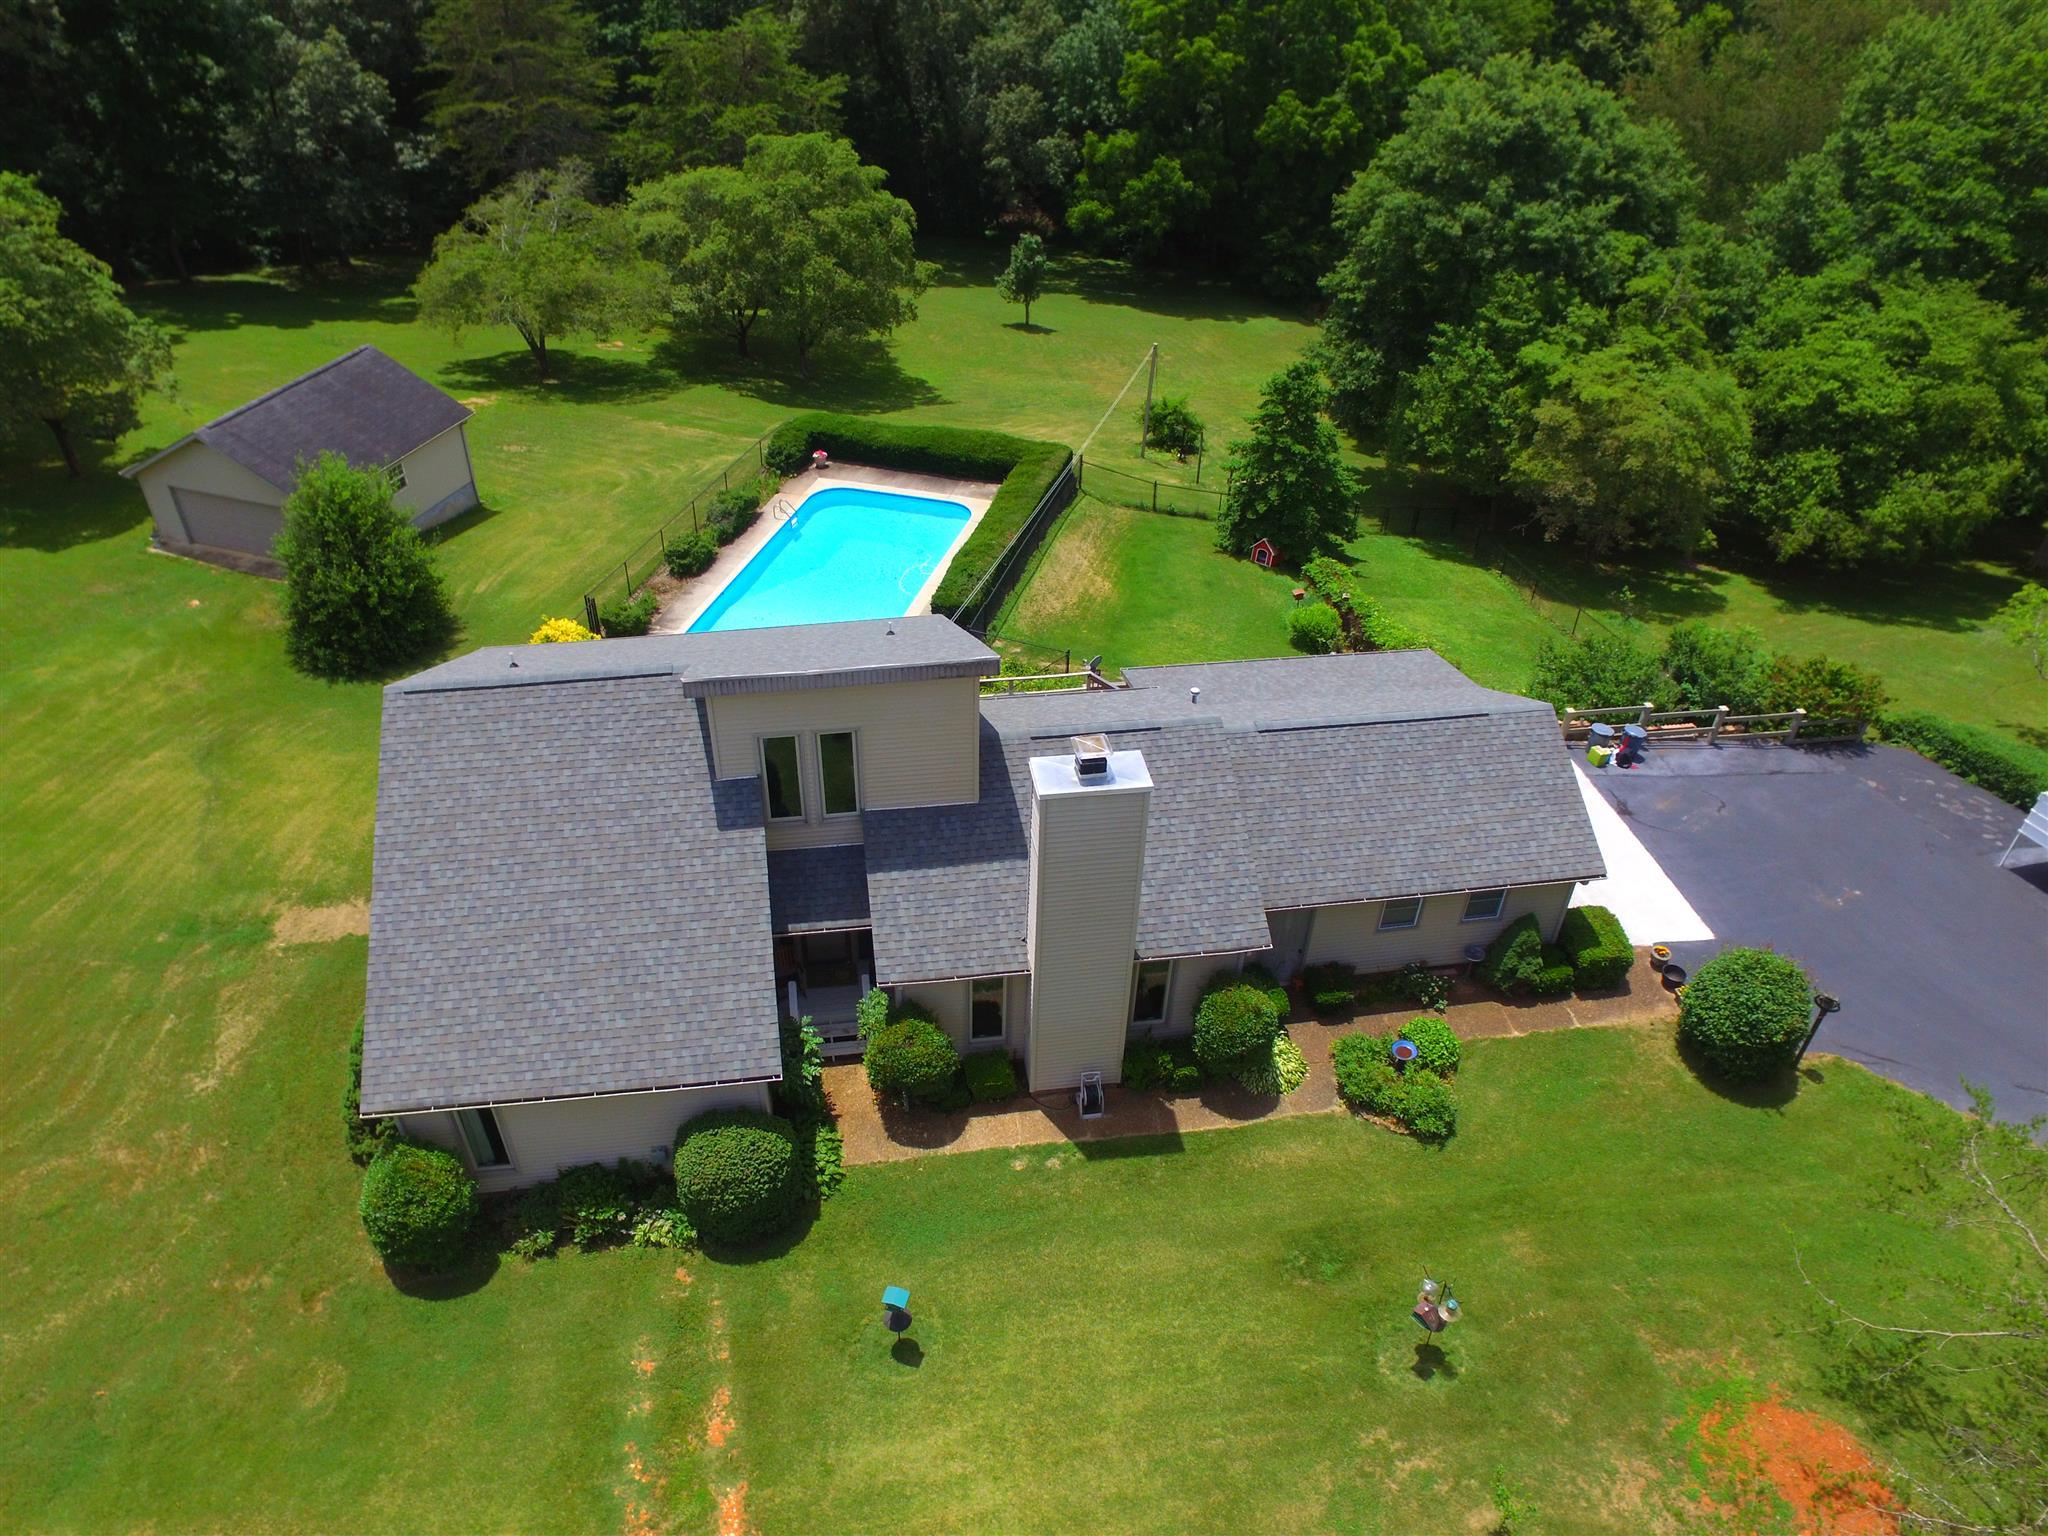 10720 Hillsboro Hwy, Hillsboro, TN 37342 - Hillsboro, TN real estate listing